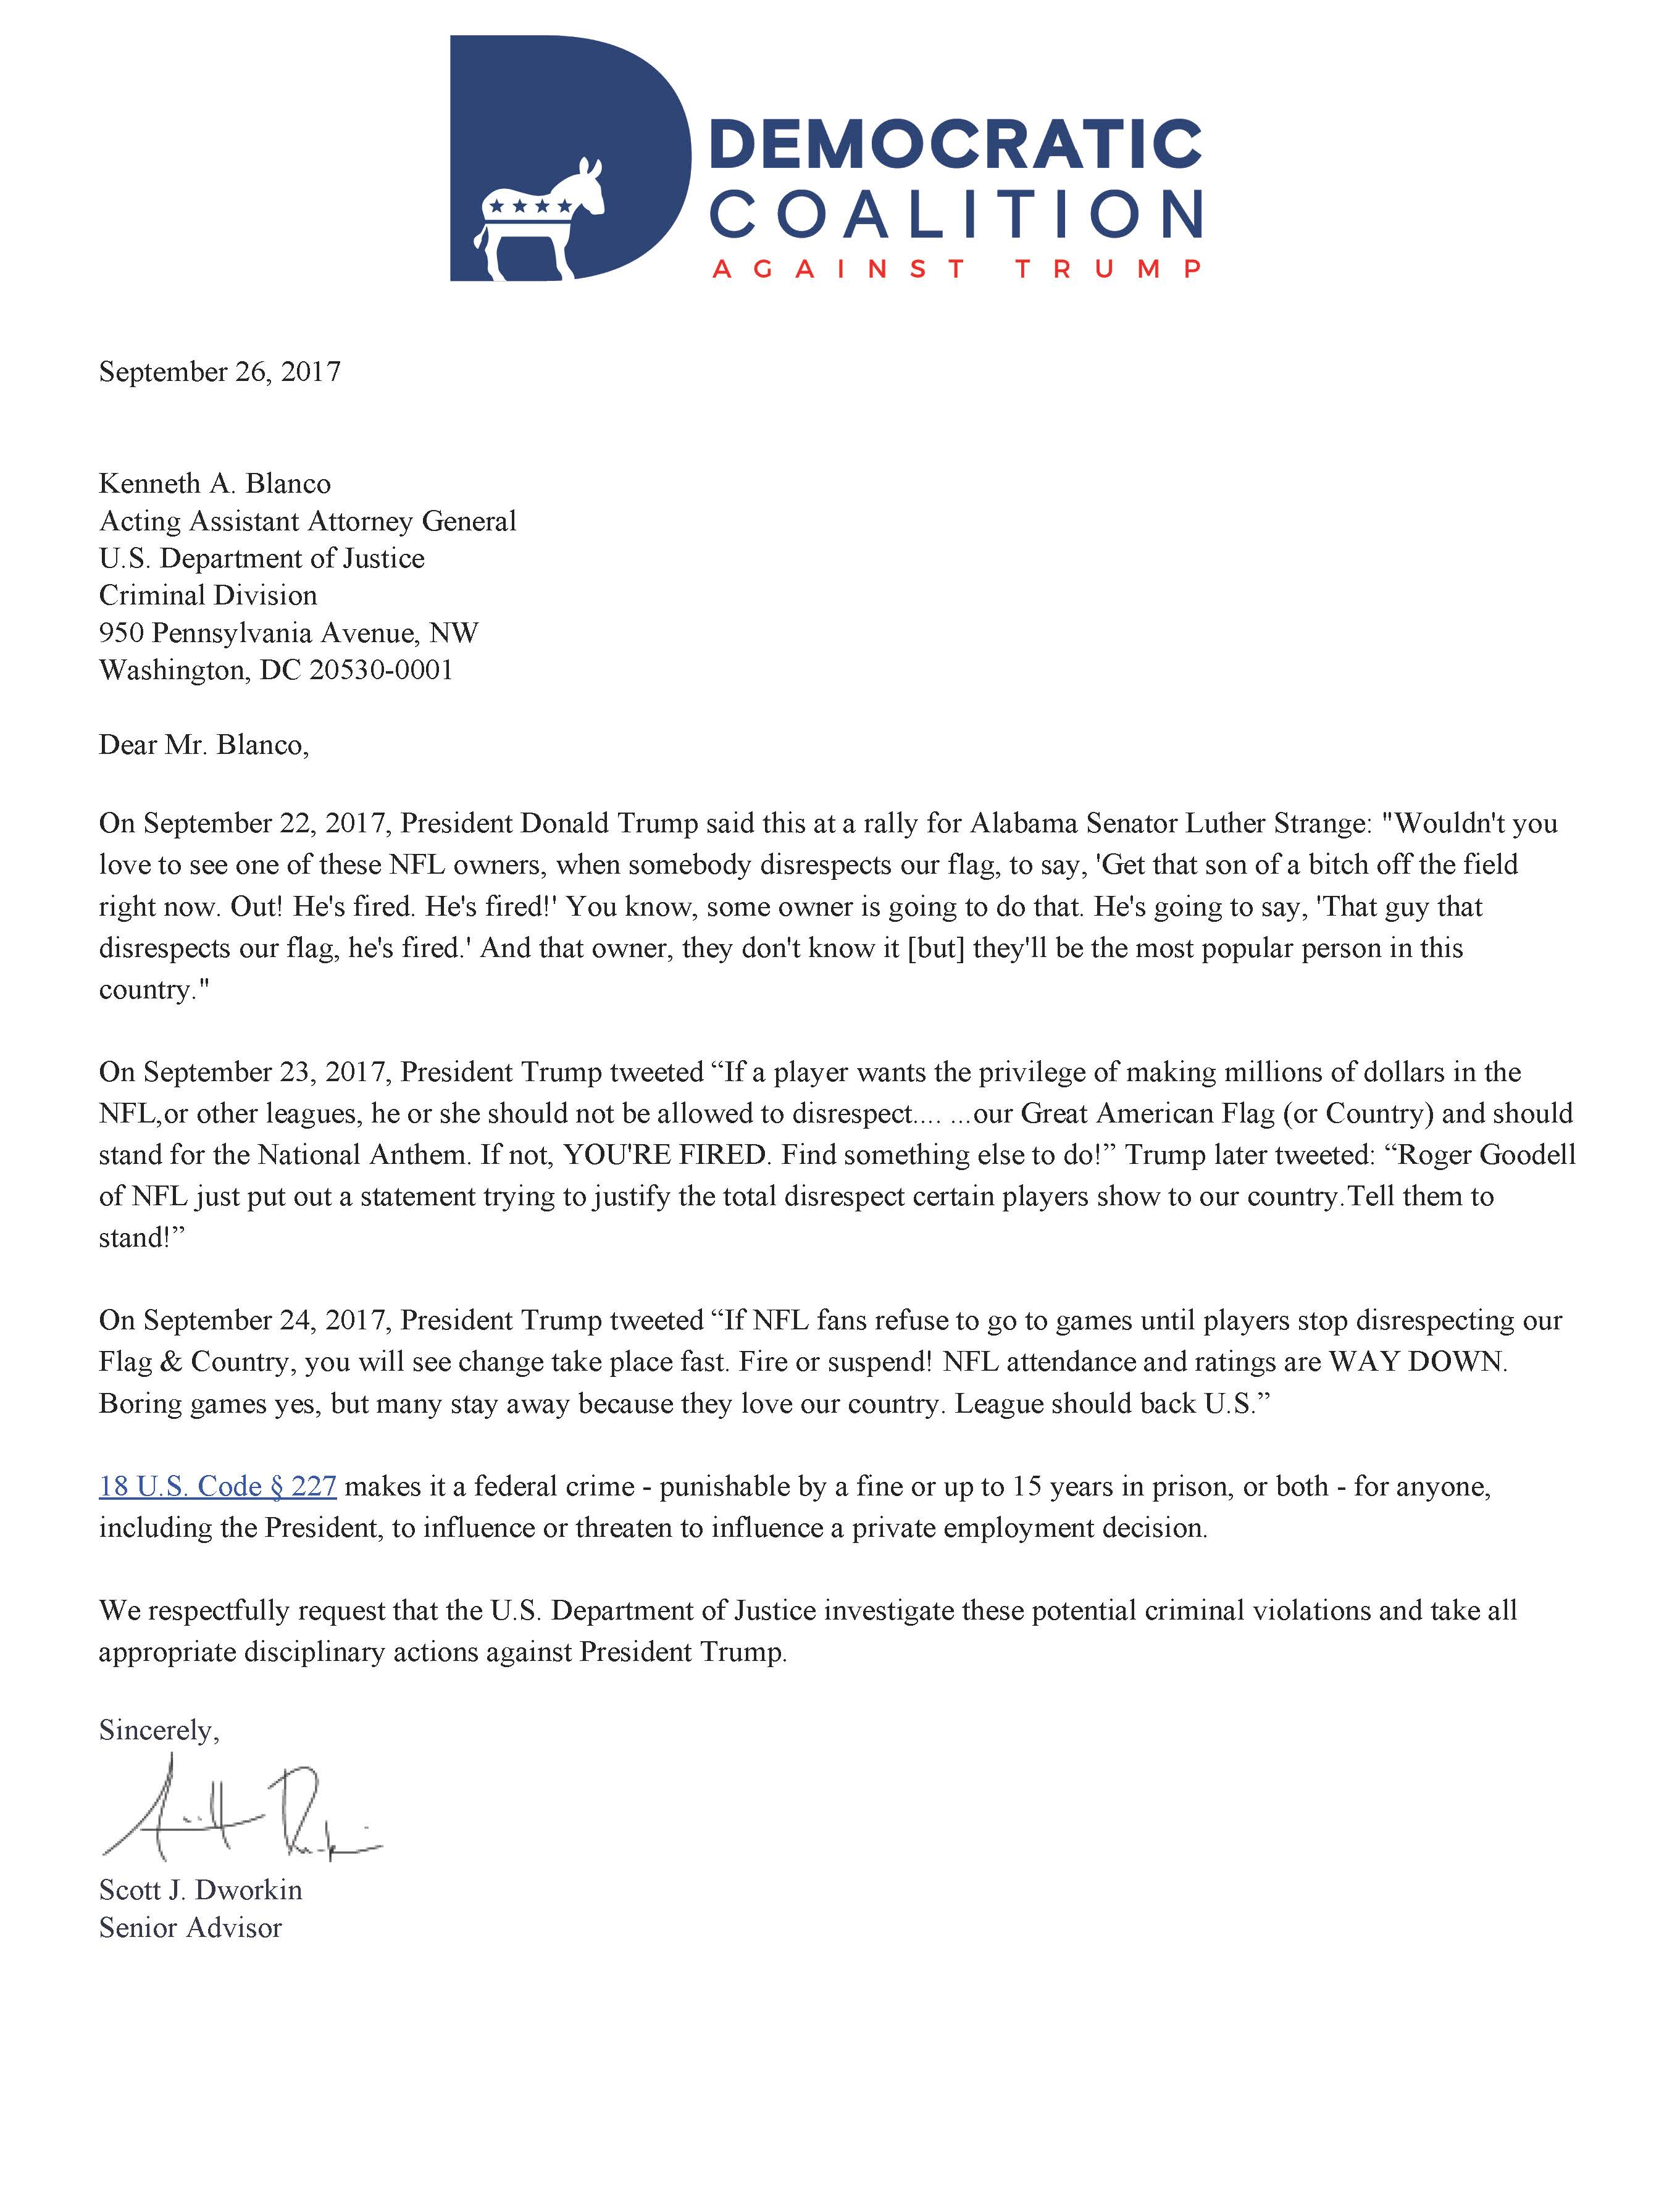 Trump Democratic Coalition Letter